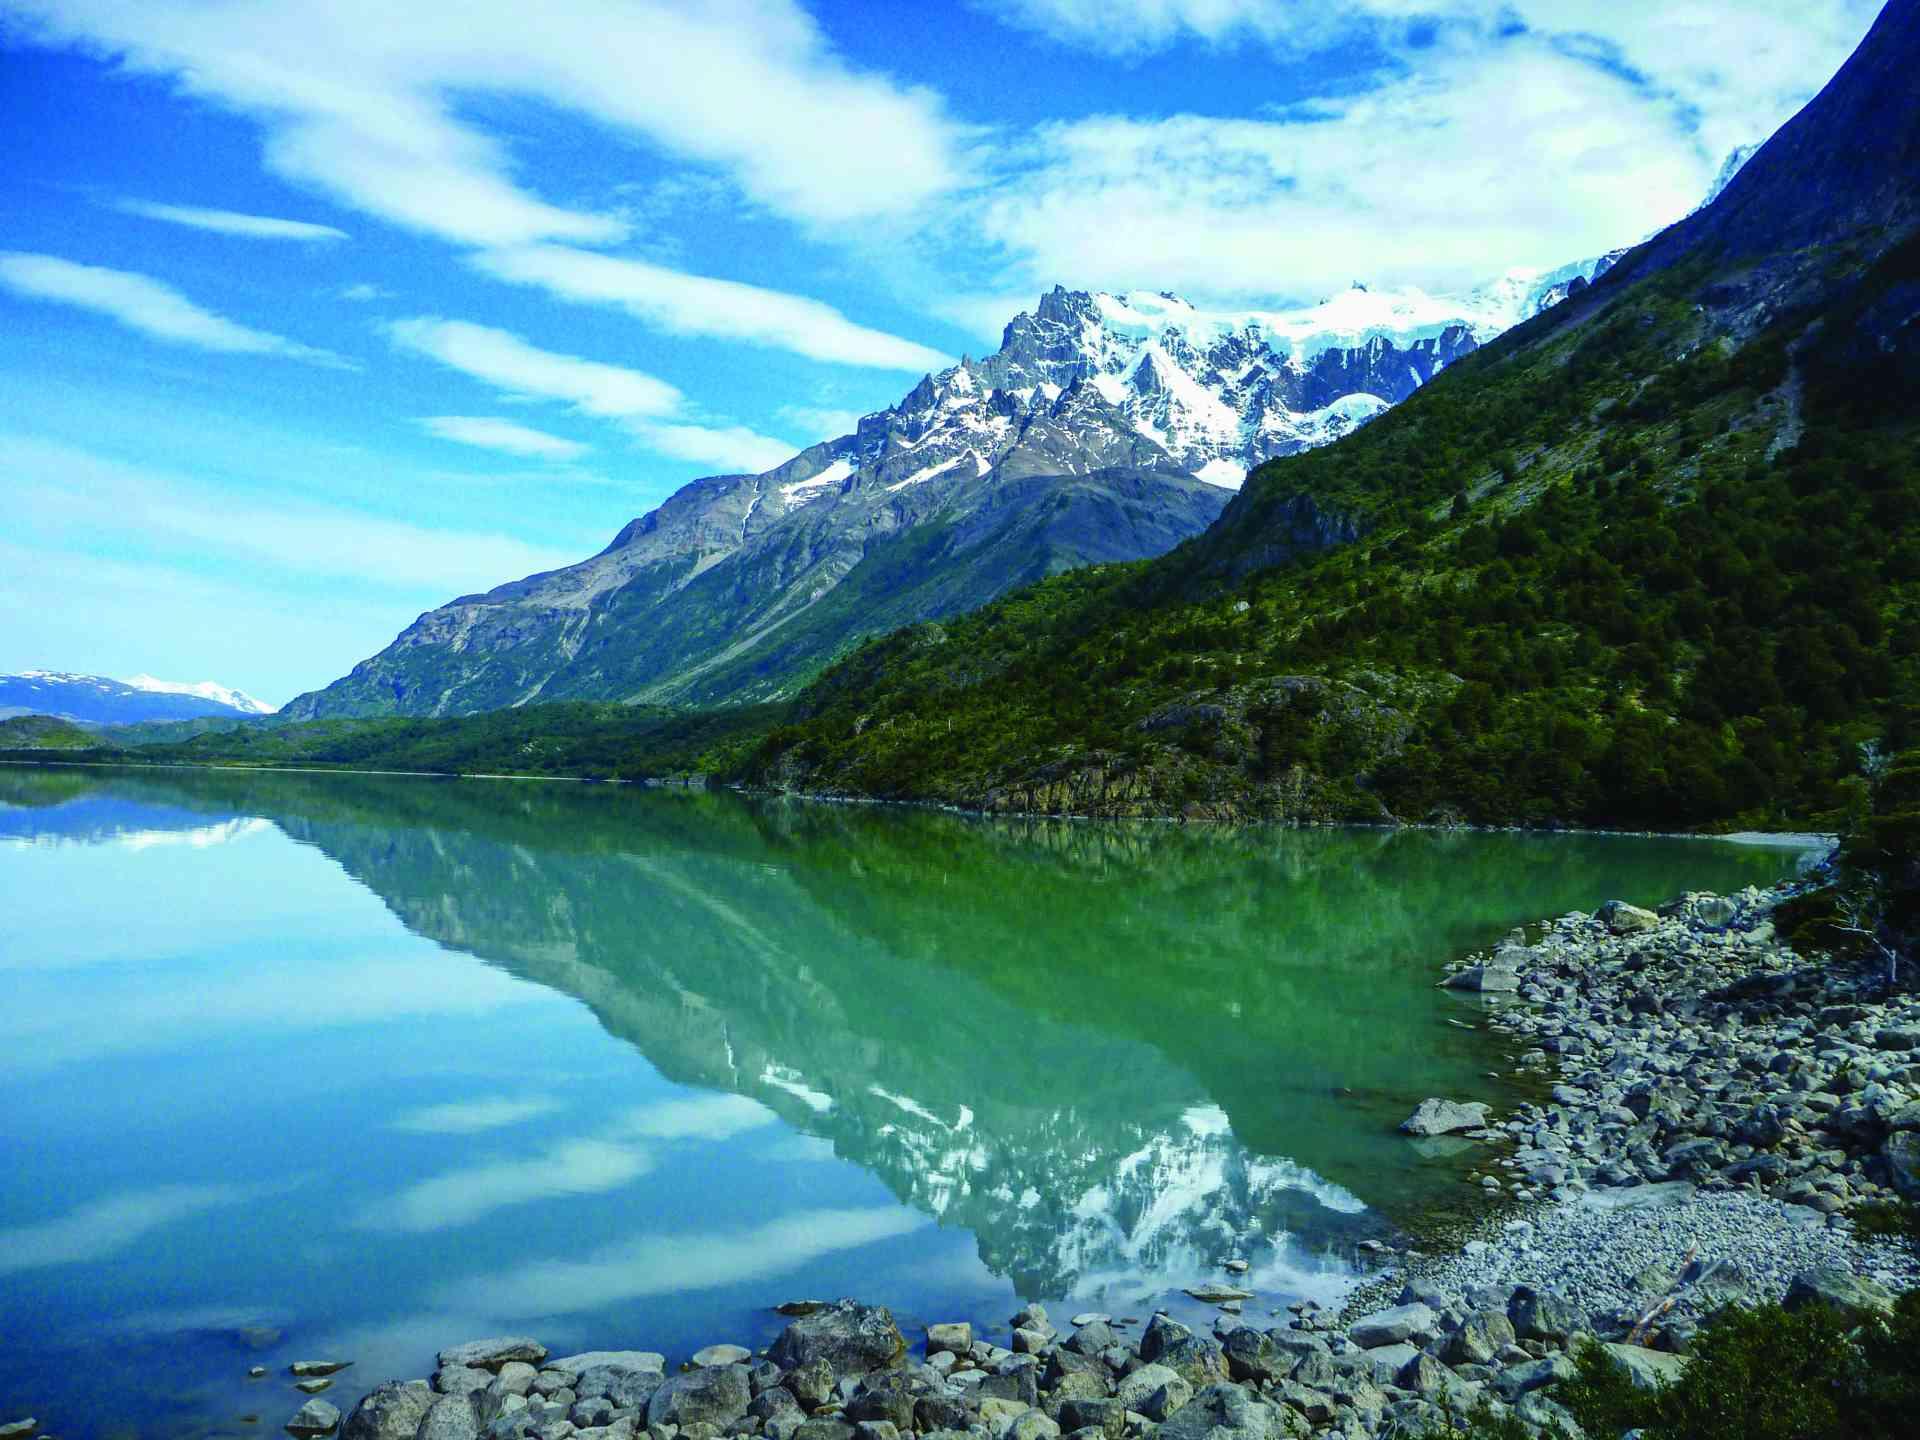 Torres del Paine National Park, Chile by Matt Baldock